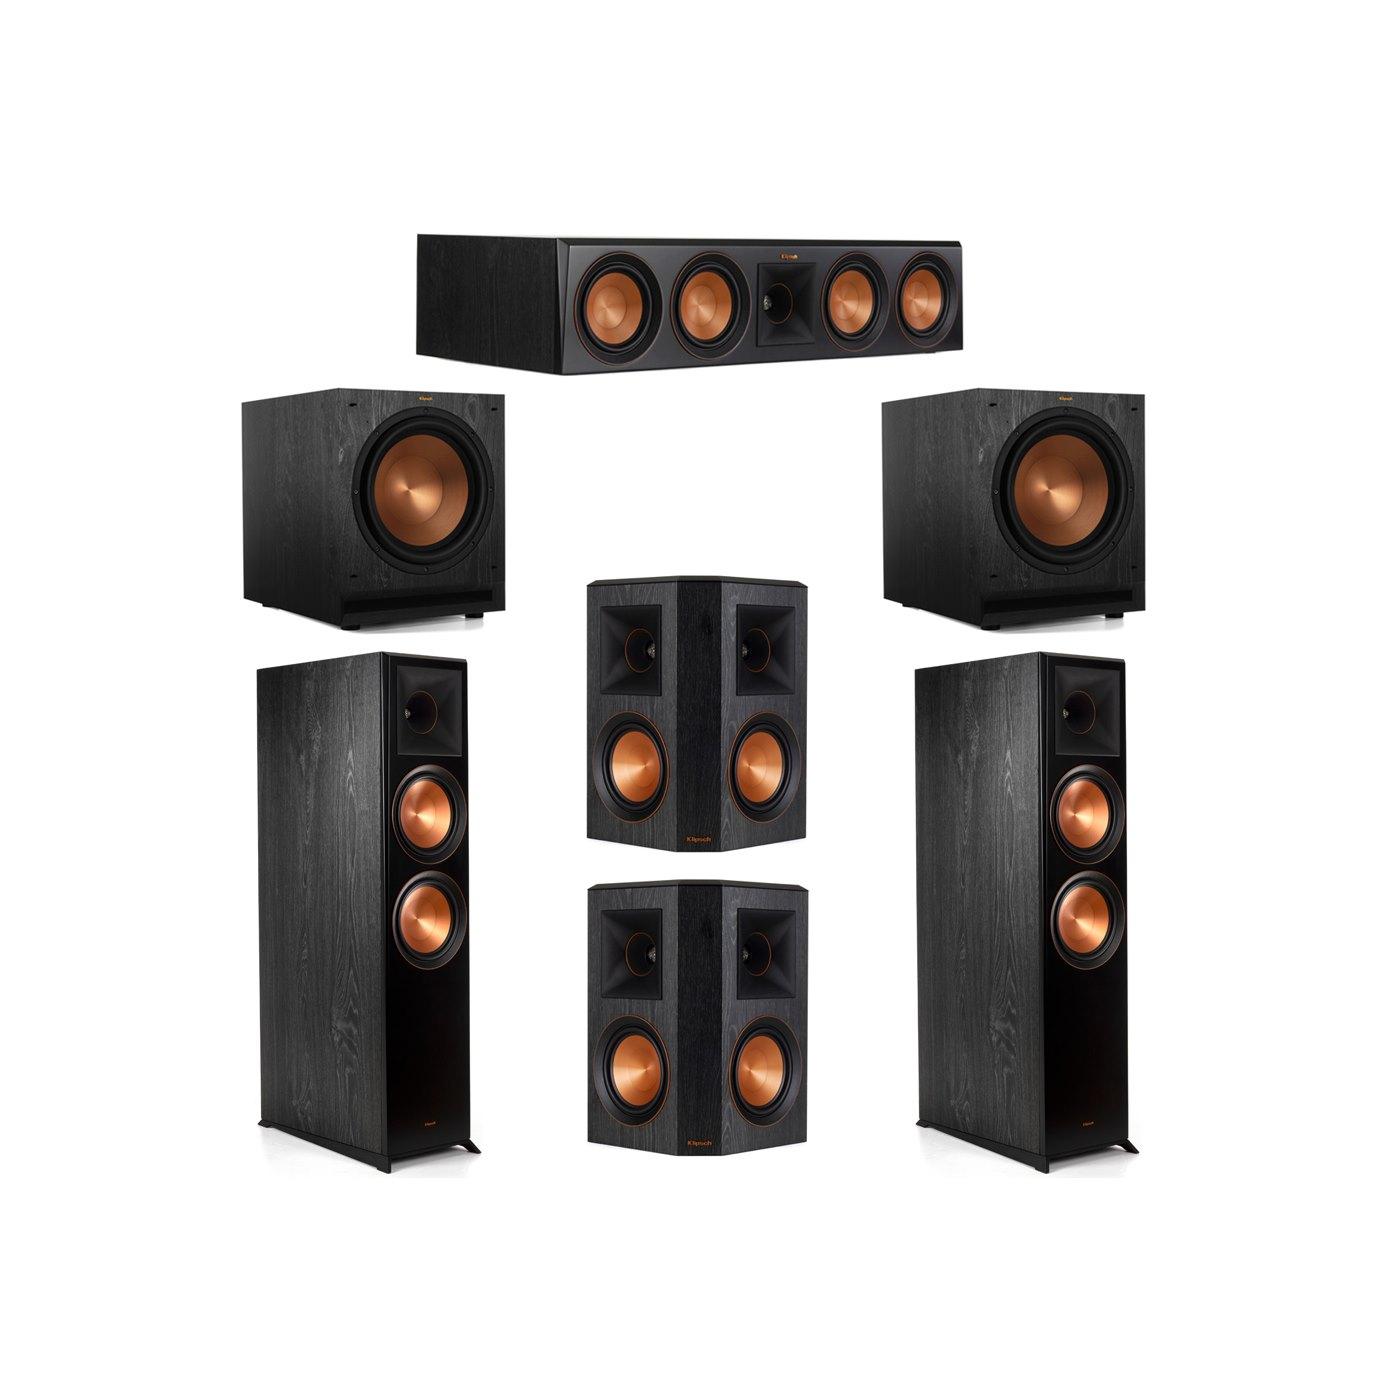 Klipsch 5.2 System with 2 RP-8000F Floorstanding Speakers, 1 Klipsch RP-504C Center Speaker, 2 Klipsch RP-502S Surround Speakers, 2 Klipsch SPL-120 Subwoofers